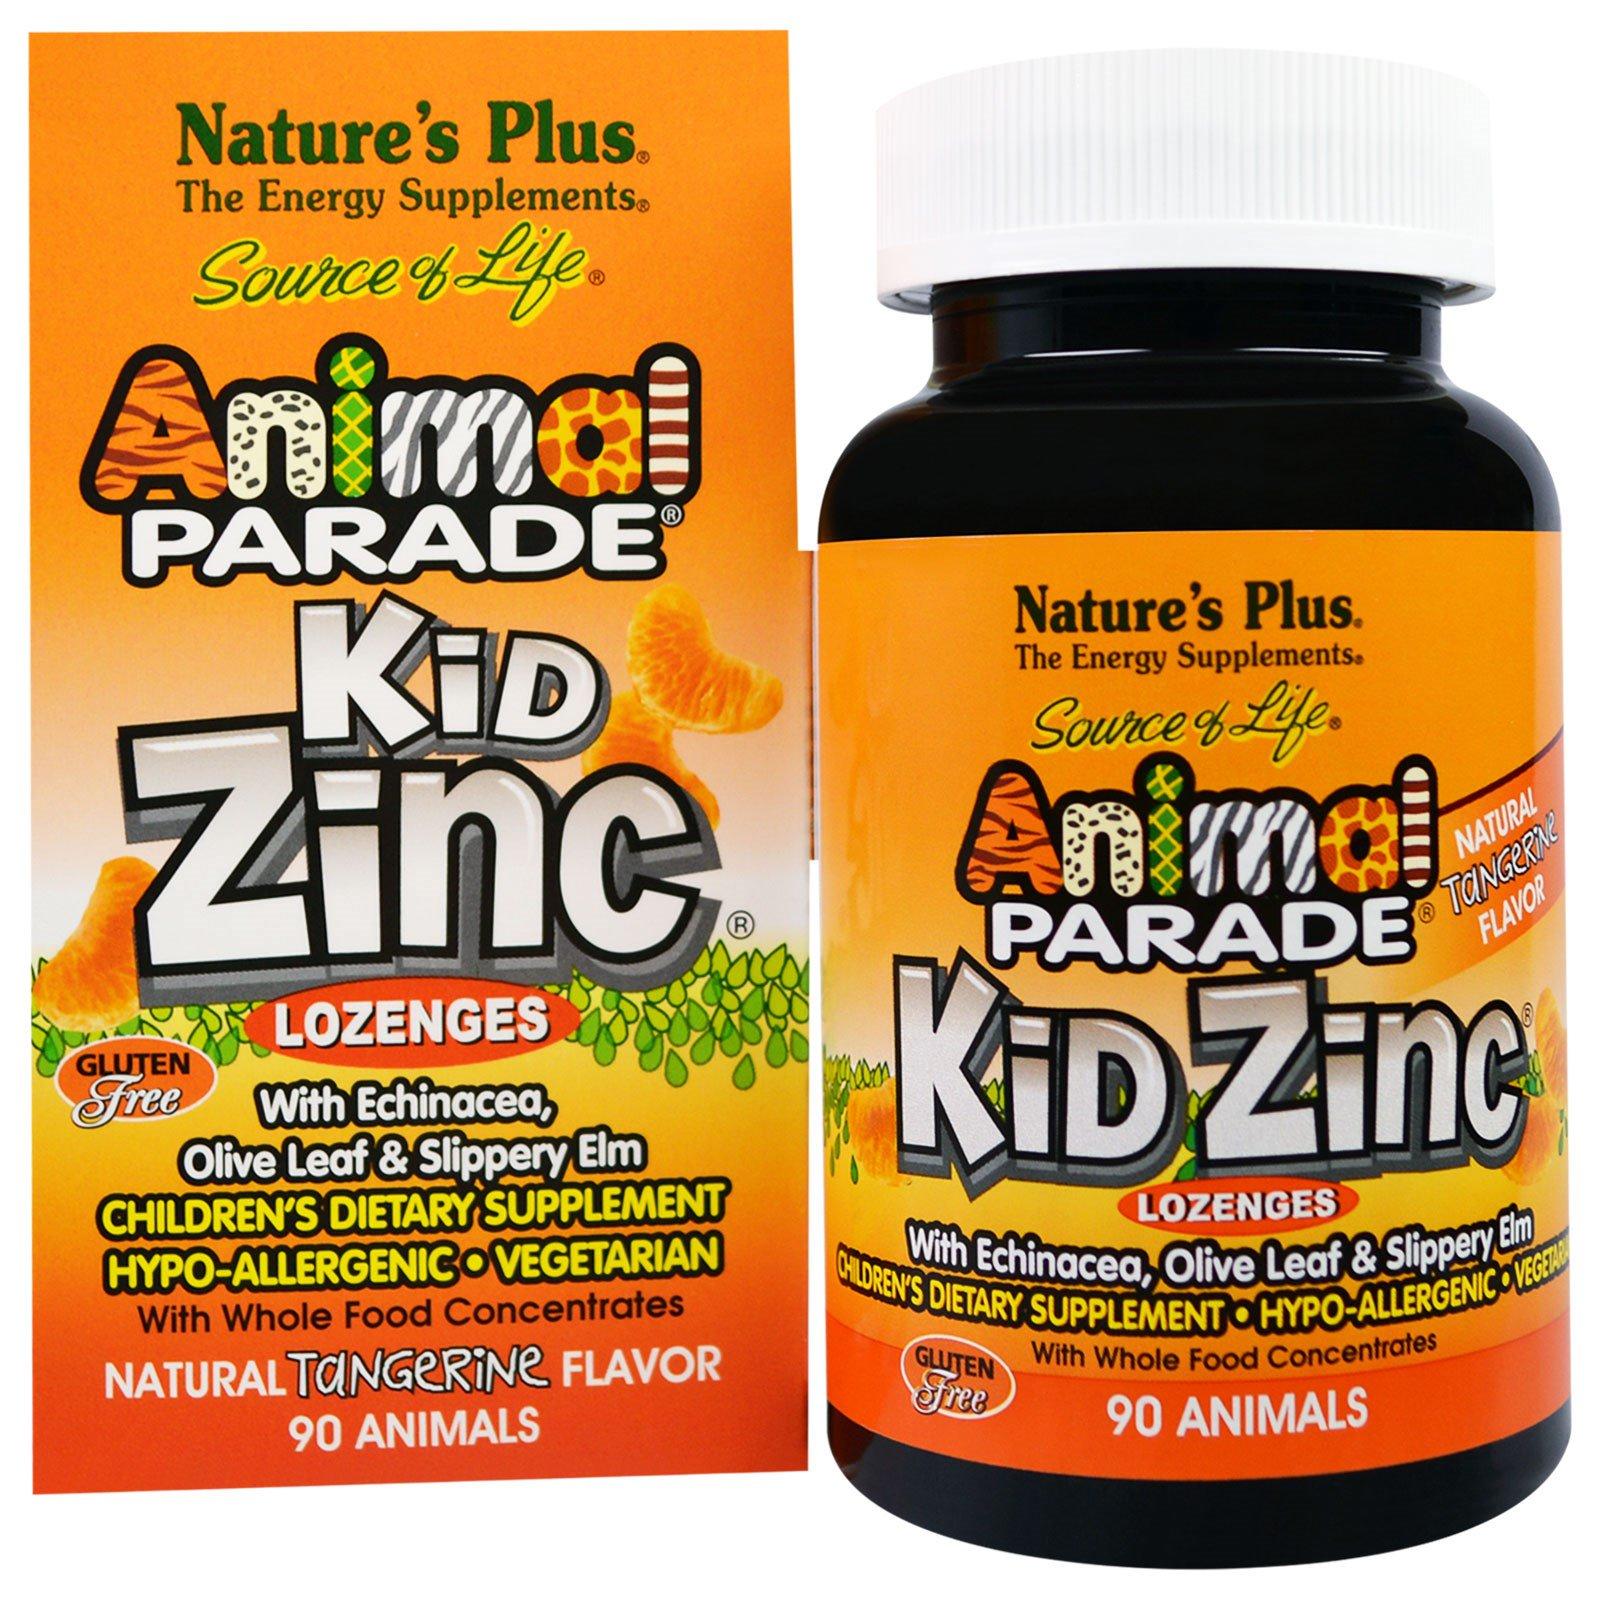 Image of Kid Zinc Lozenges, Natural Tangerine Flavor (90 Animals) - Nature's Plus 0097467299641